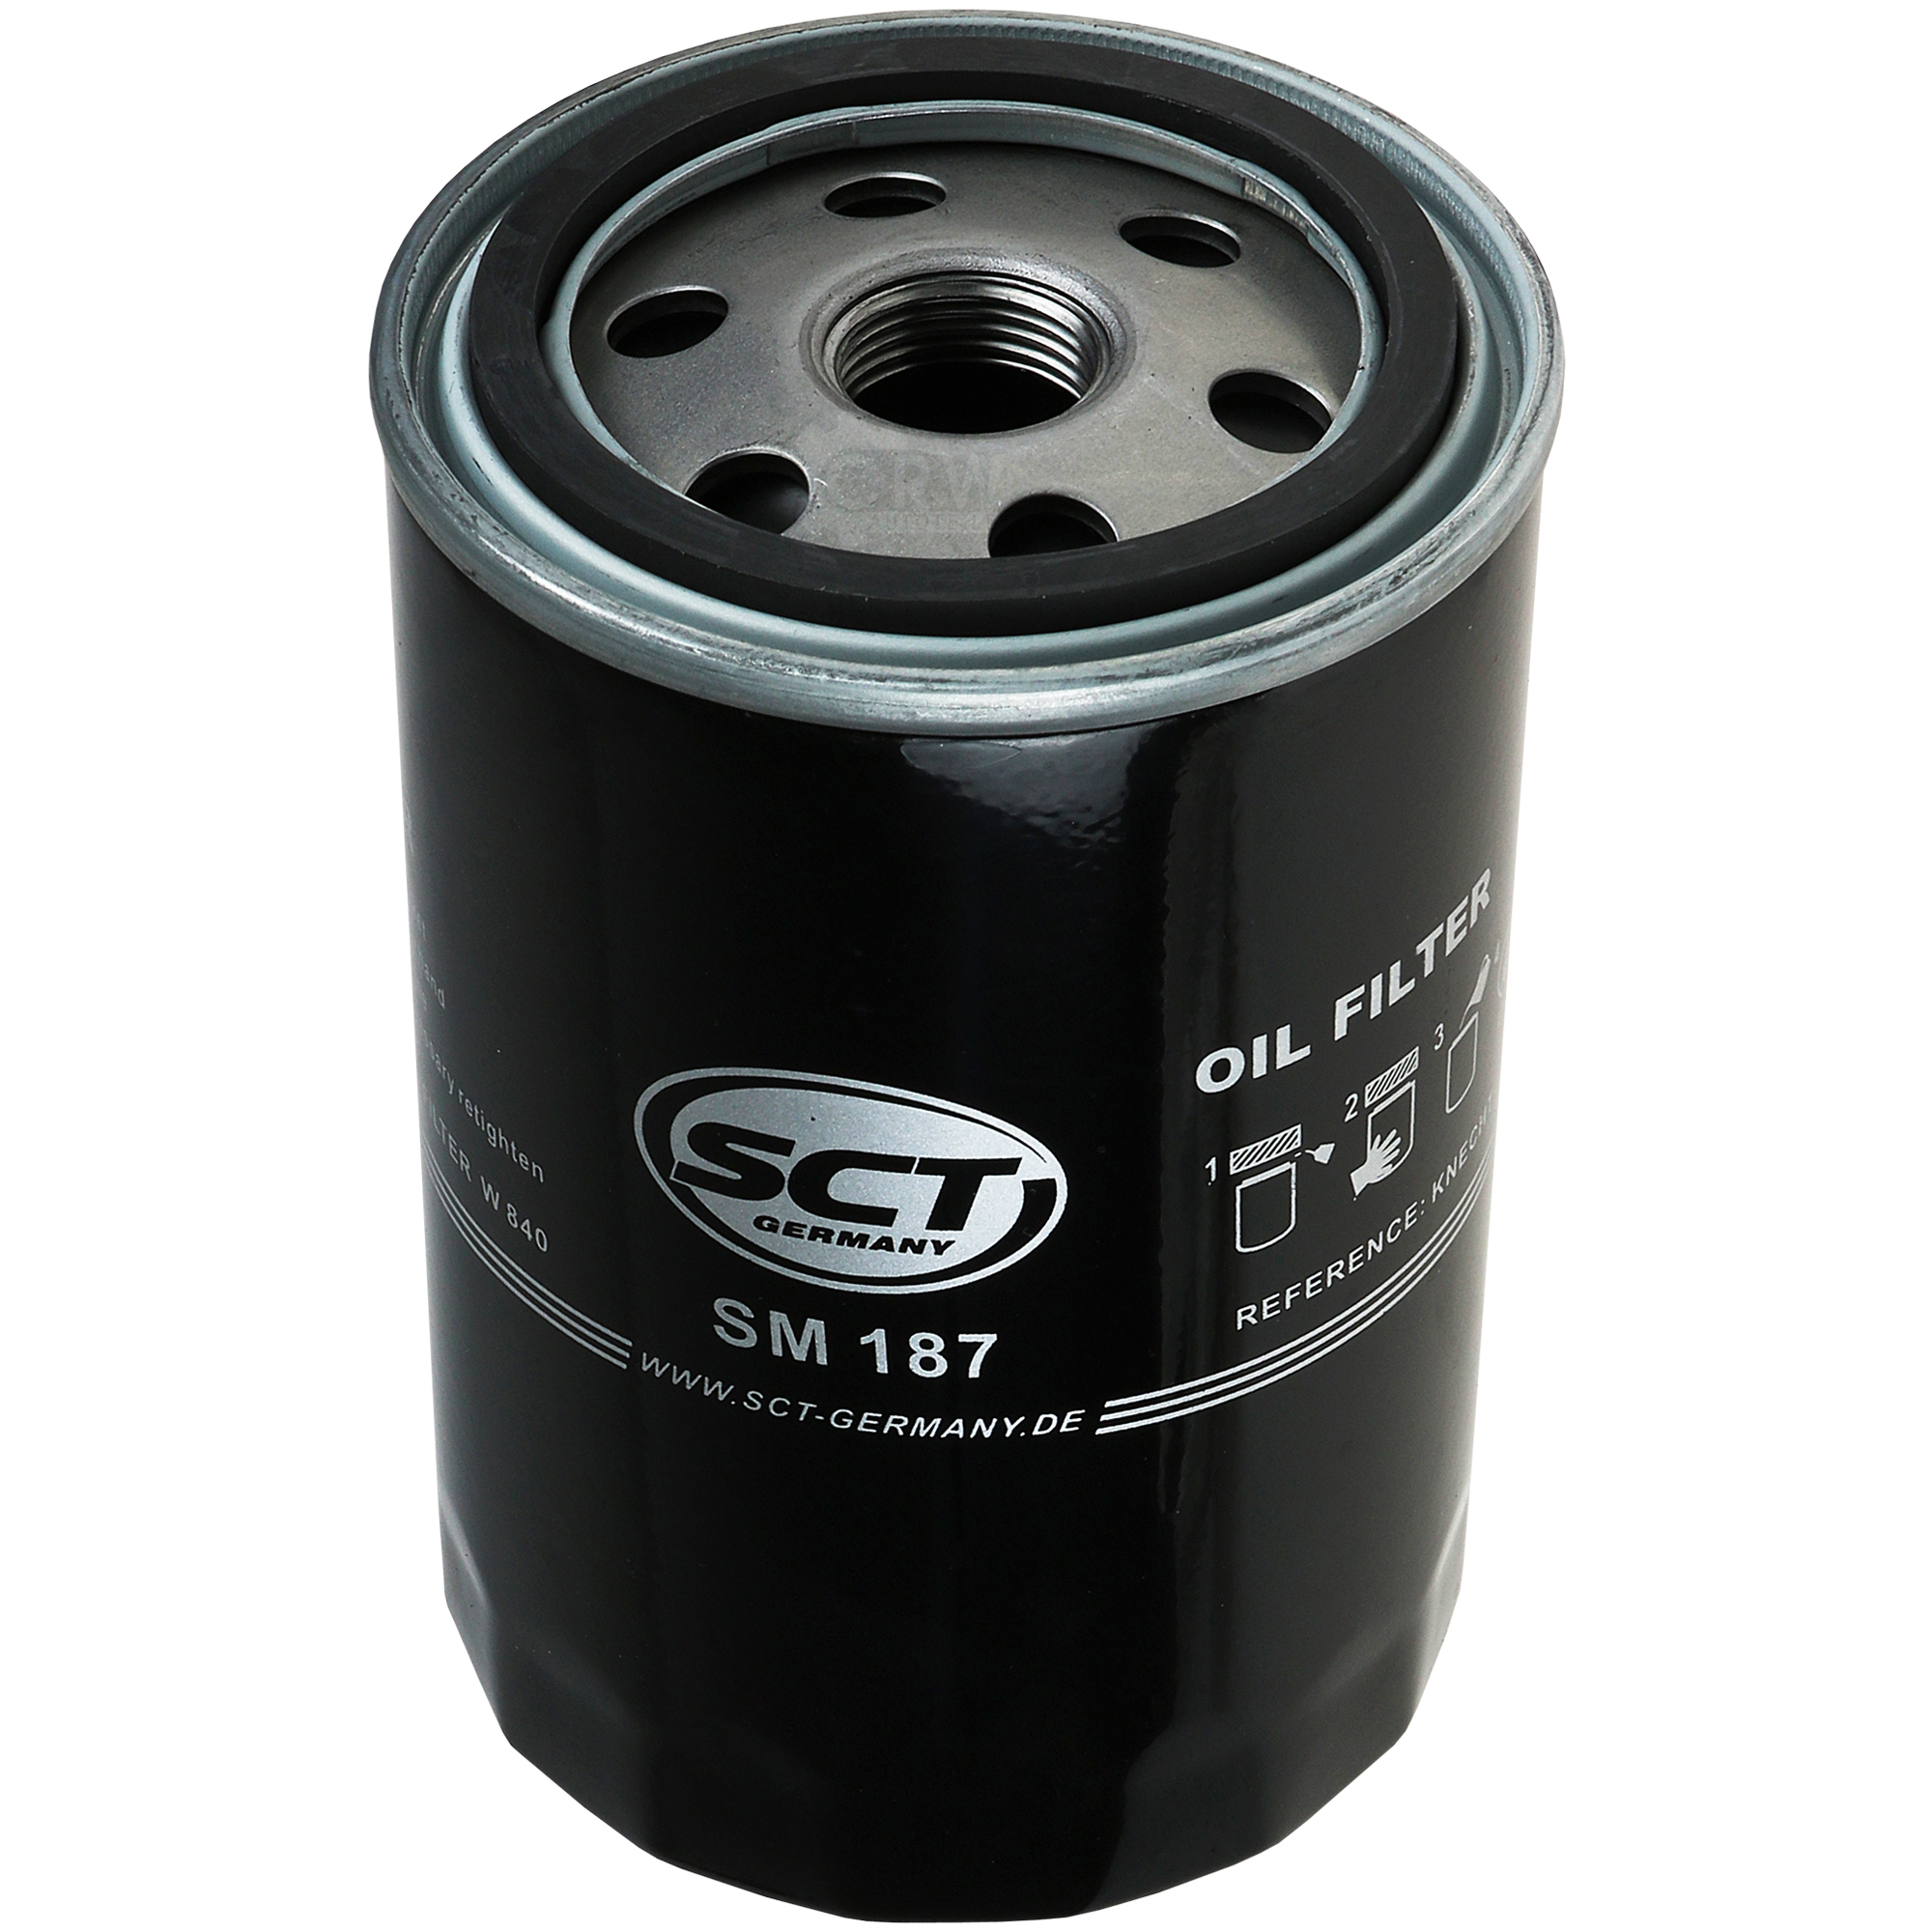 Cambio-de-aceite-set-5l-MANNOL-energy-premium-5w-30-aceite-del-motor-filtro-sct-kit-10140337 miniatura 11